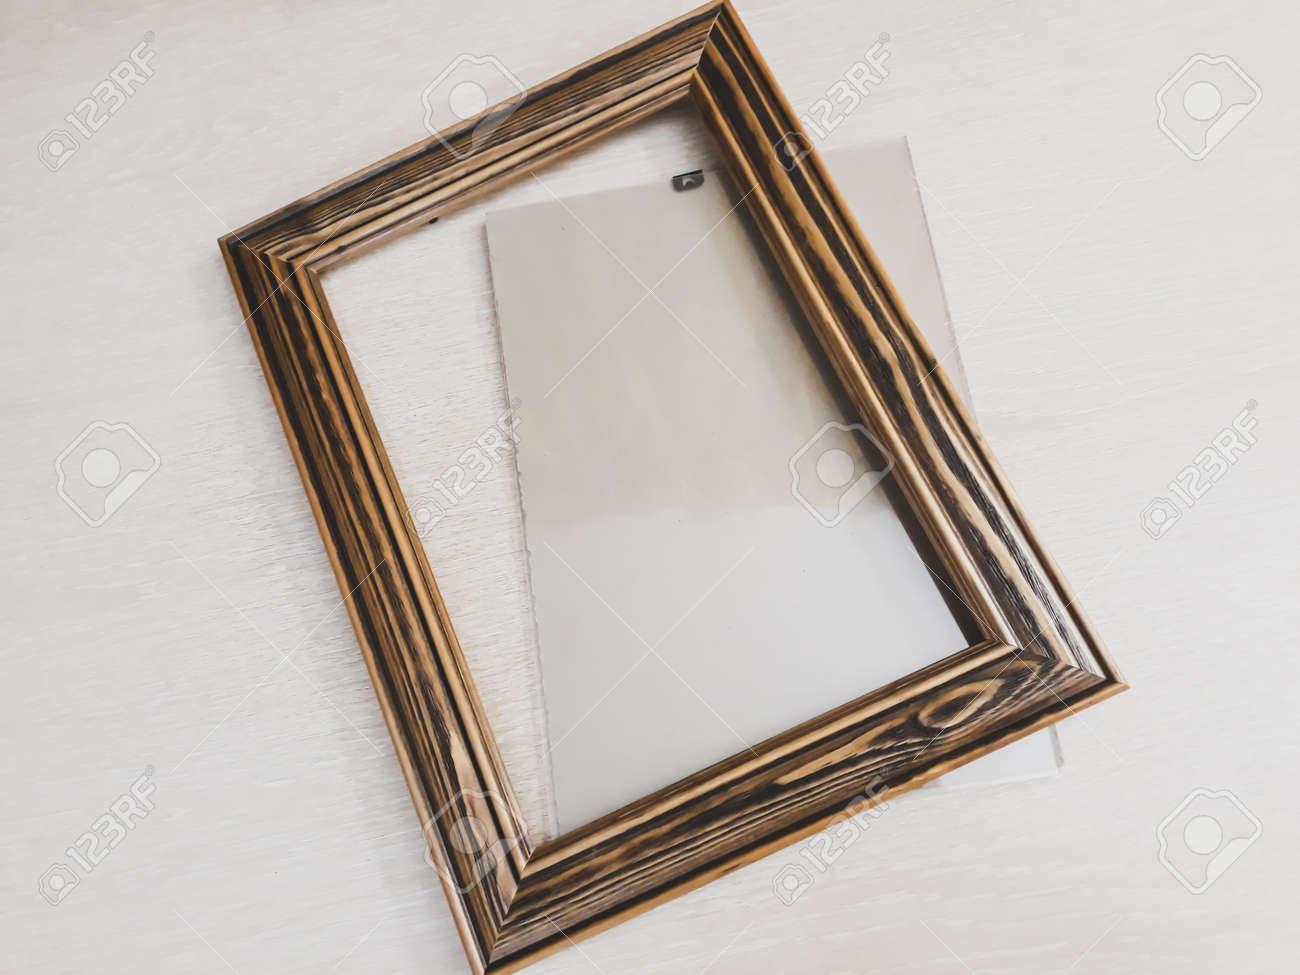 Frame of dark wood for needlework on a light background, horizontal photo - 159737689